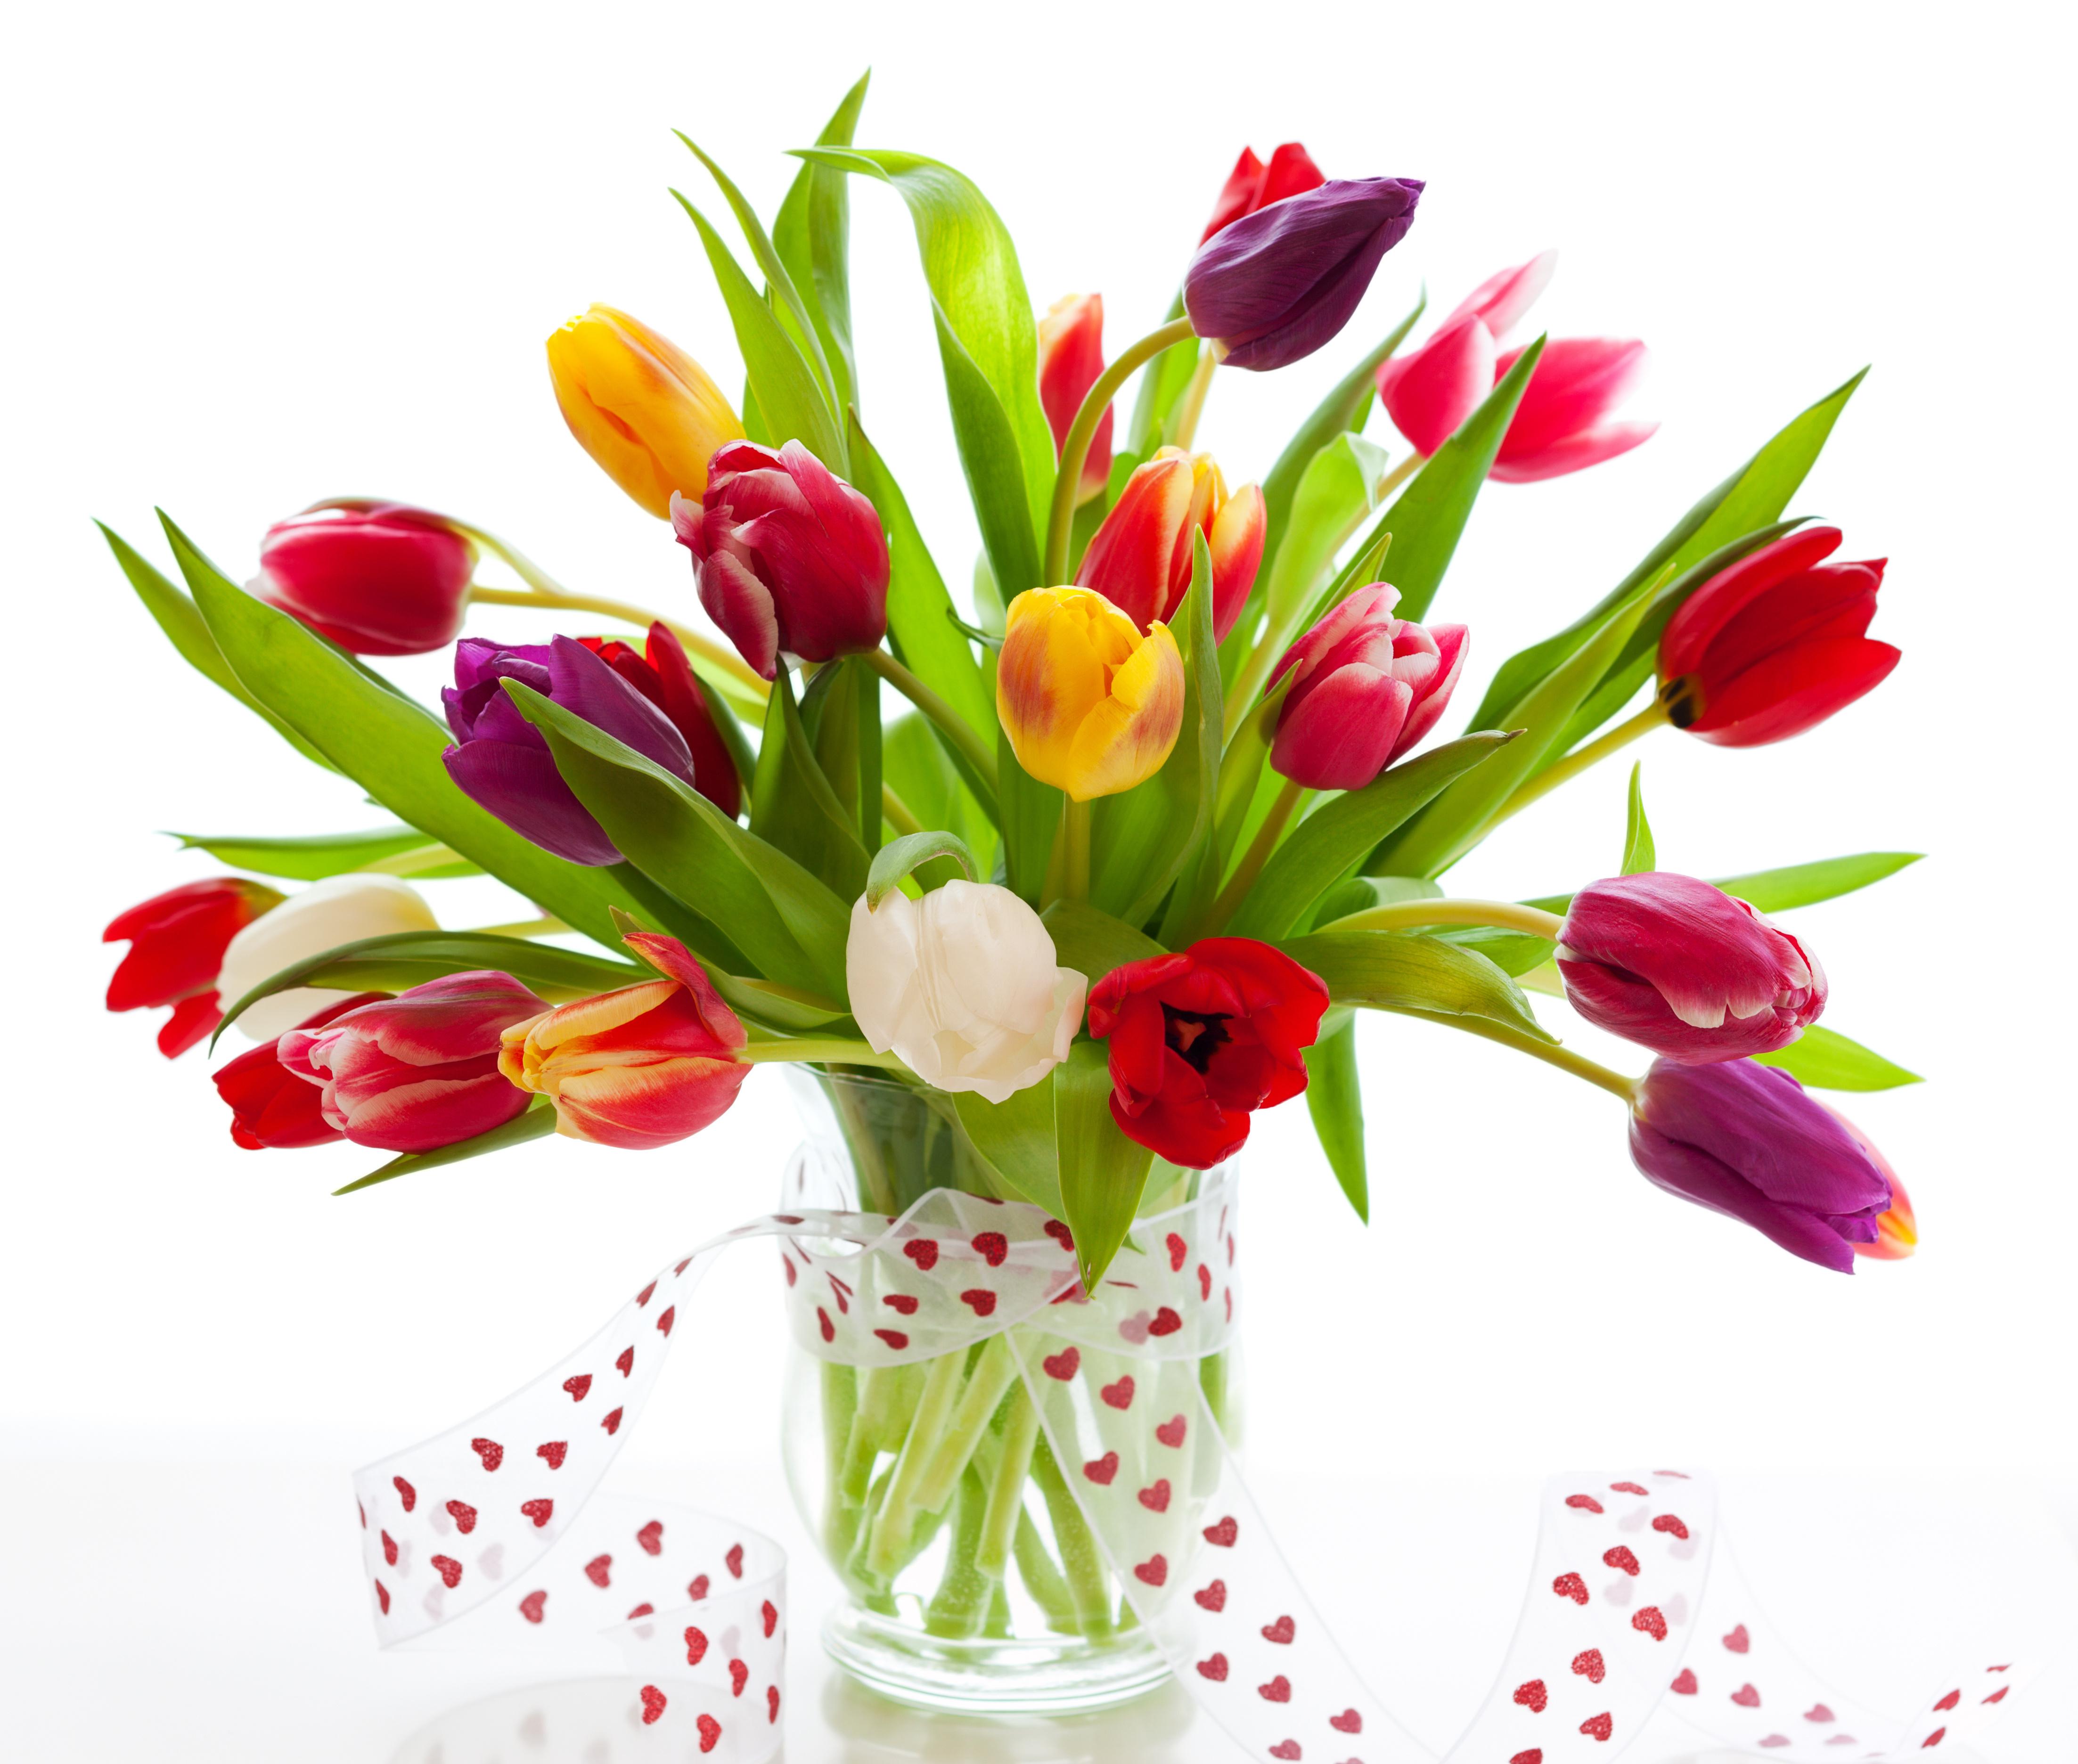 Flower 4k Ultra HD Wallpaper | Background Image